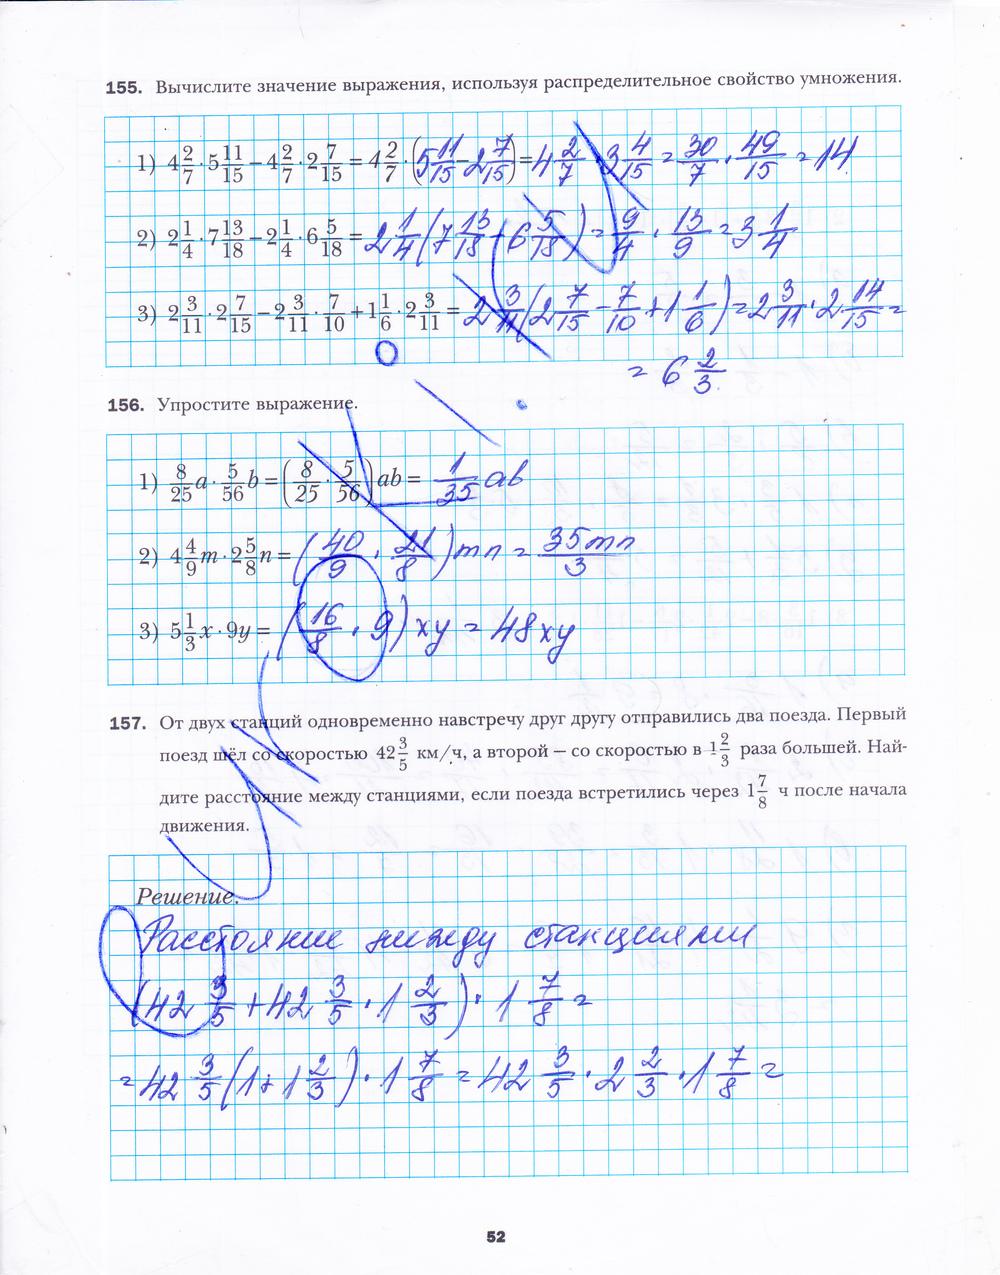 Гдз к зборнику 5 класс математика а.г мерзляк